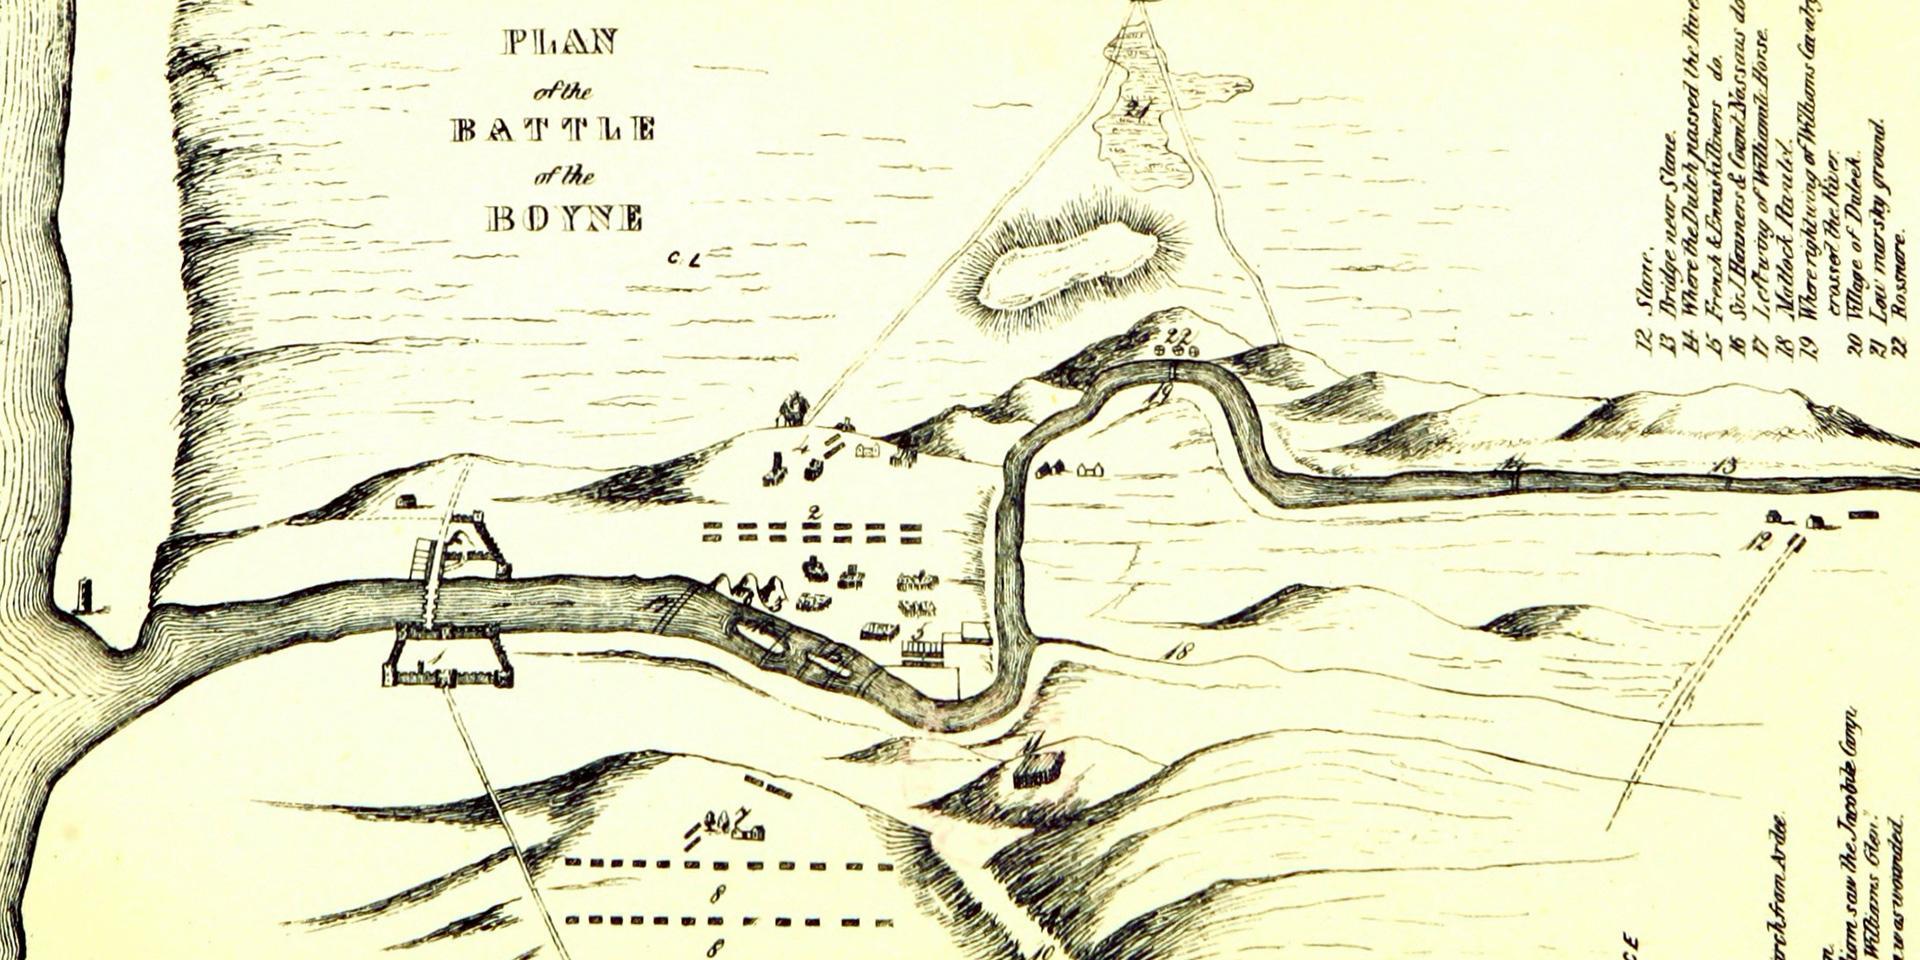 Plan of the Battle of the Boyne